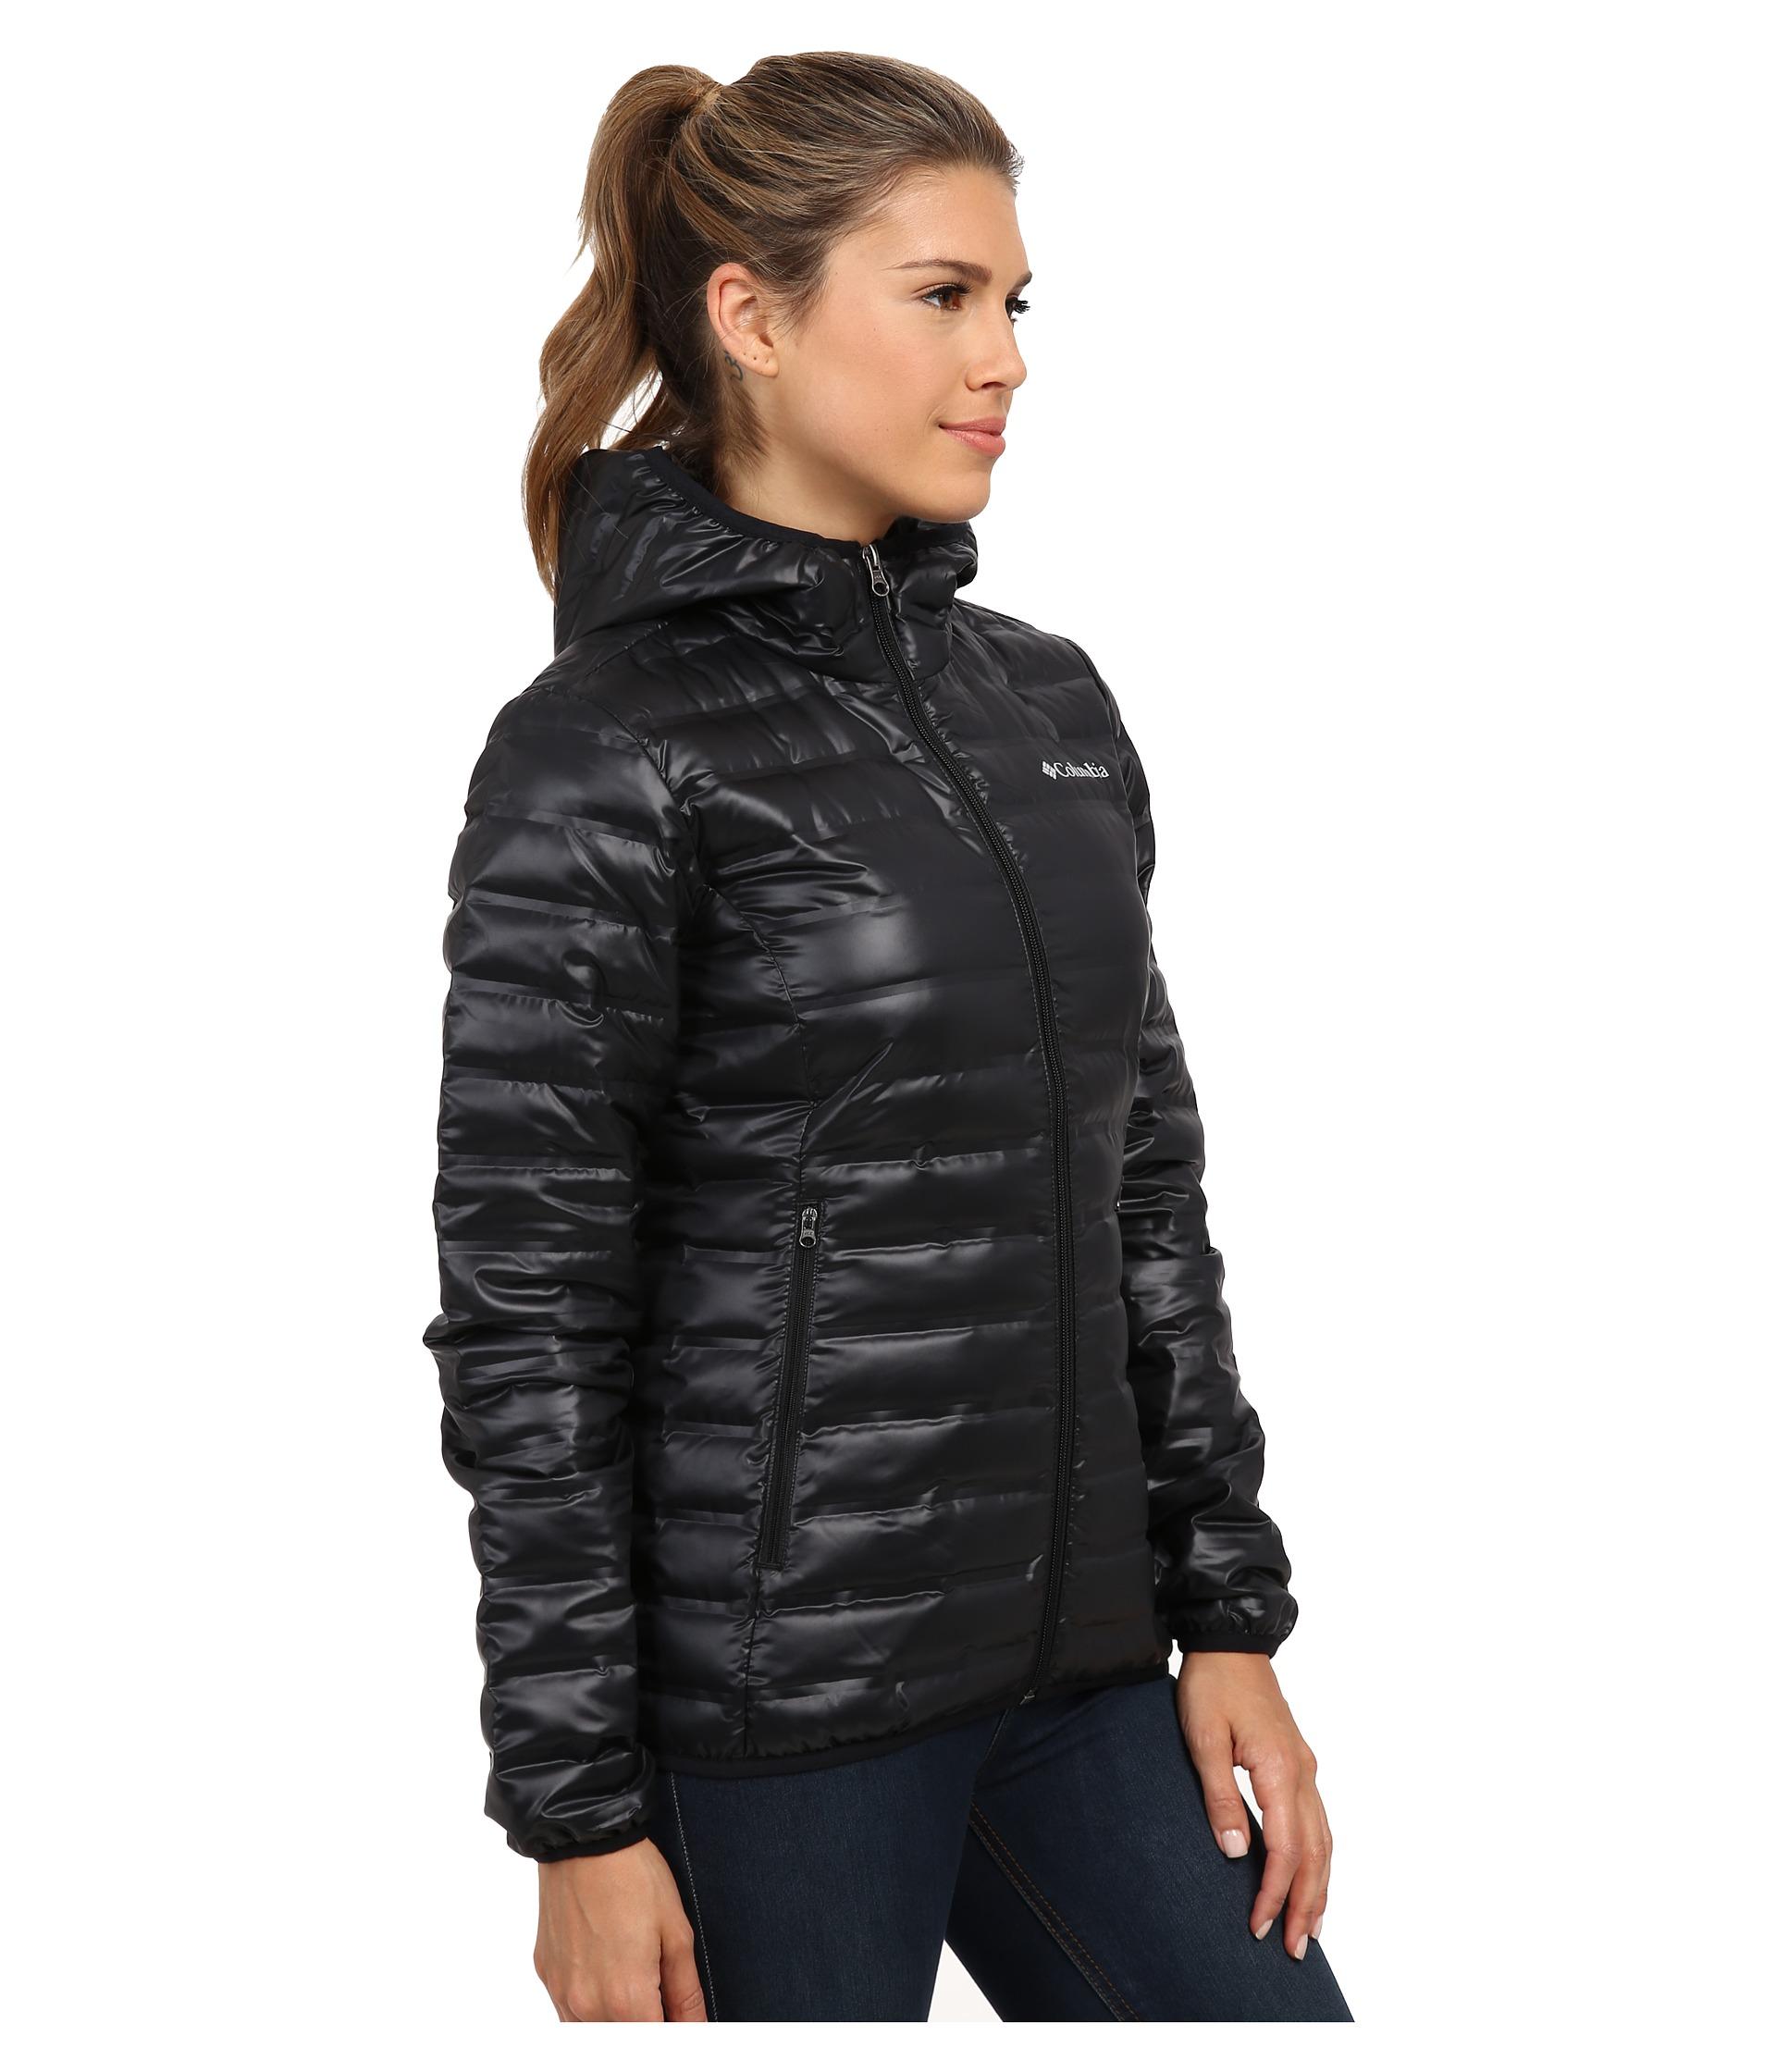 Women S Plus Columbia Coats - Most Popular Coat 2017